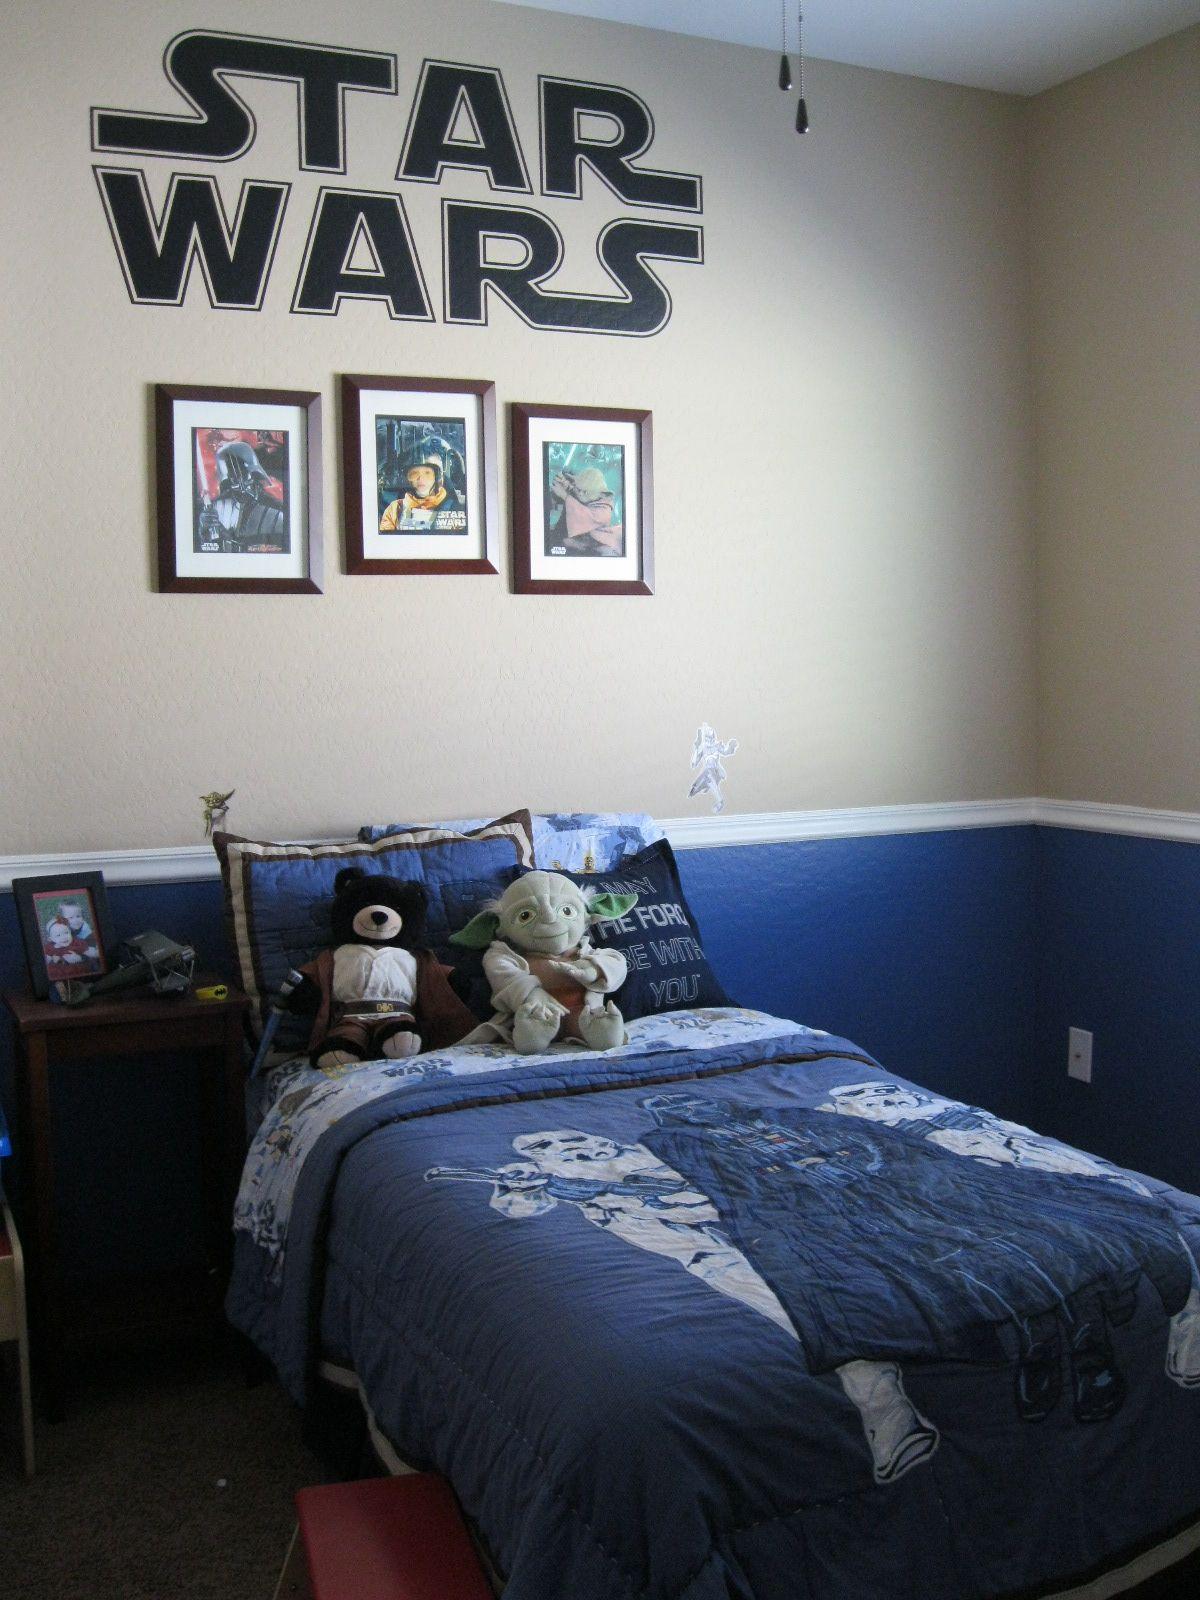 Talmage S Star Wars Room Star Wars Kids Room Star Wars Room